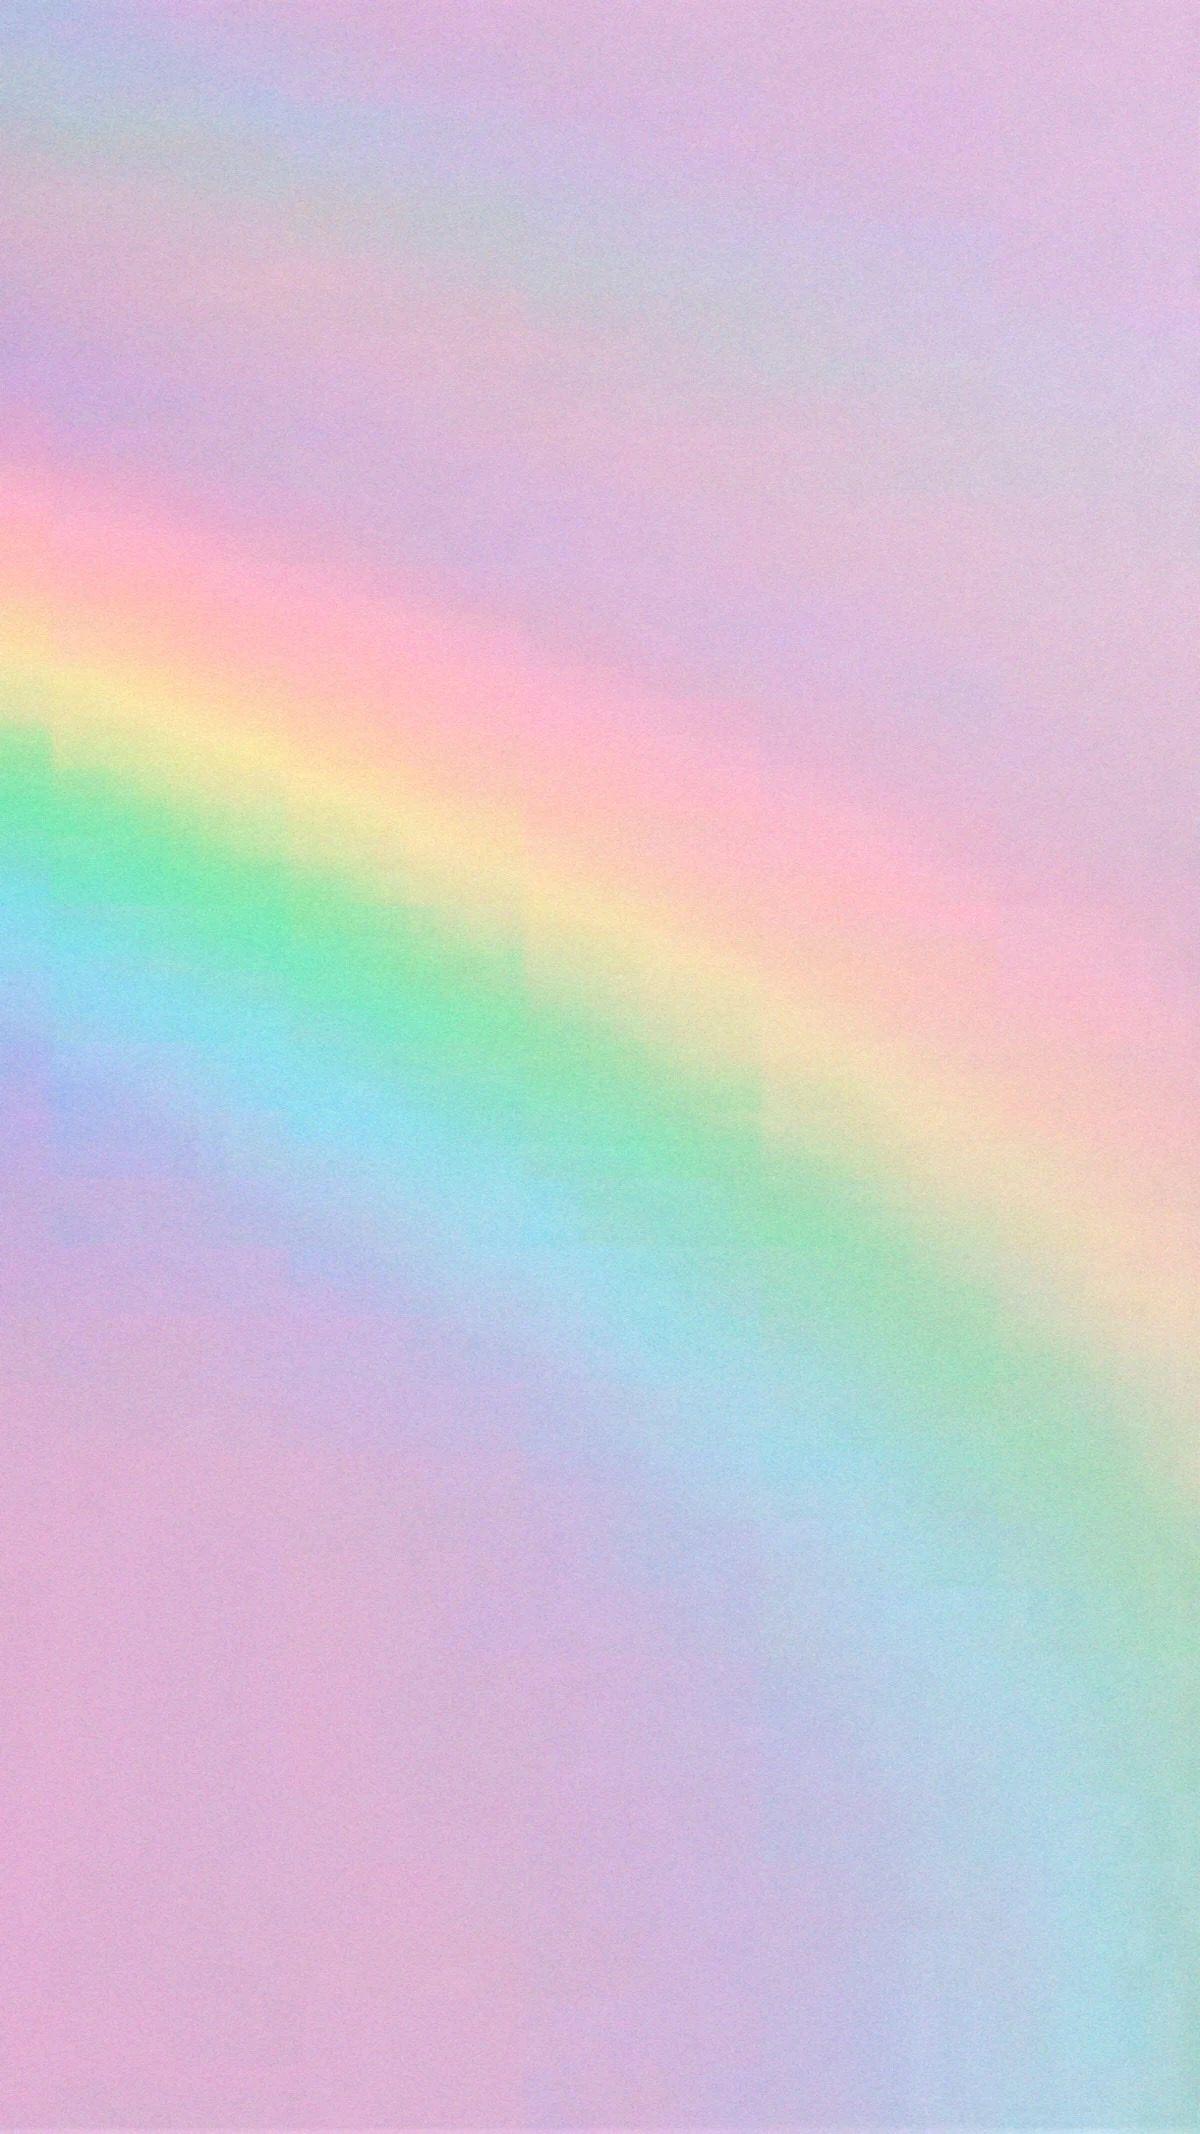 Rainbow Aesthetic Wallpapers Top Free Rainbow Aesthetic